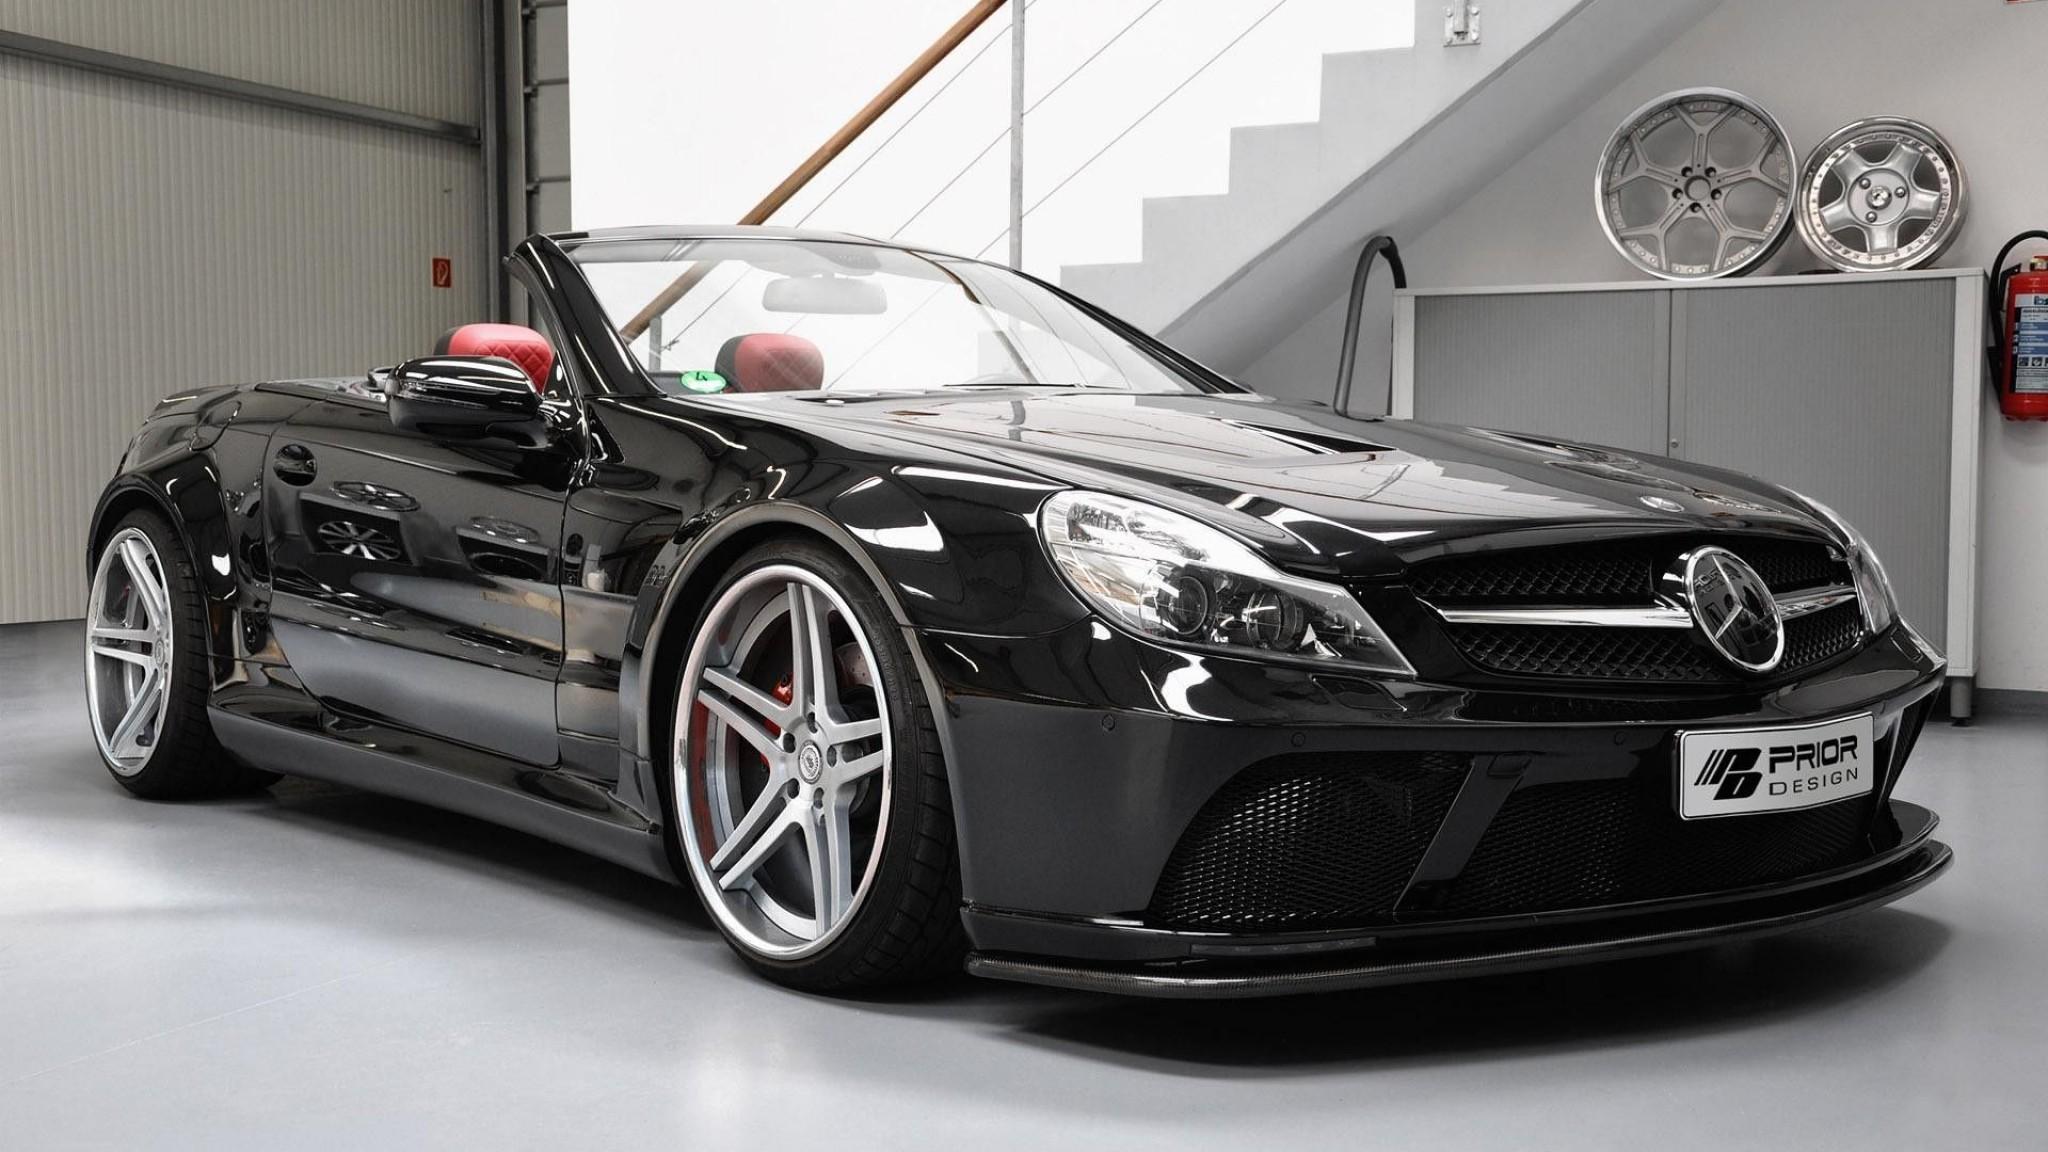 mercedes benz sl  prior  design  convertible  black  coupe  the HD Wallpaper